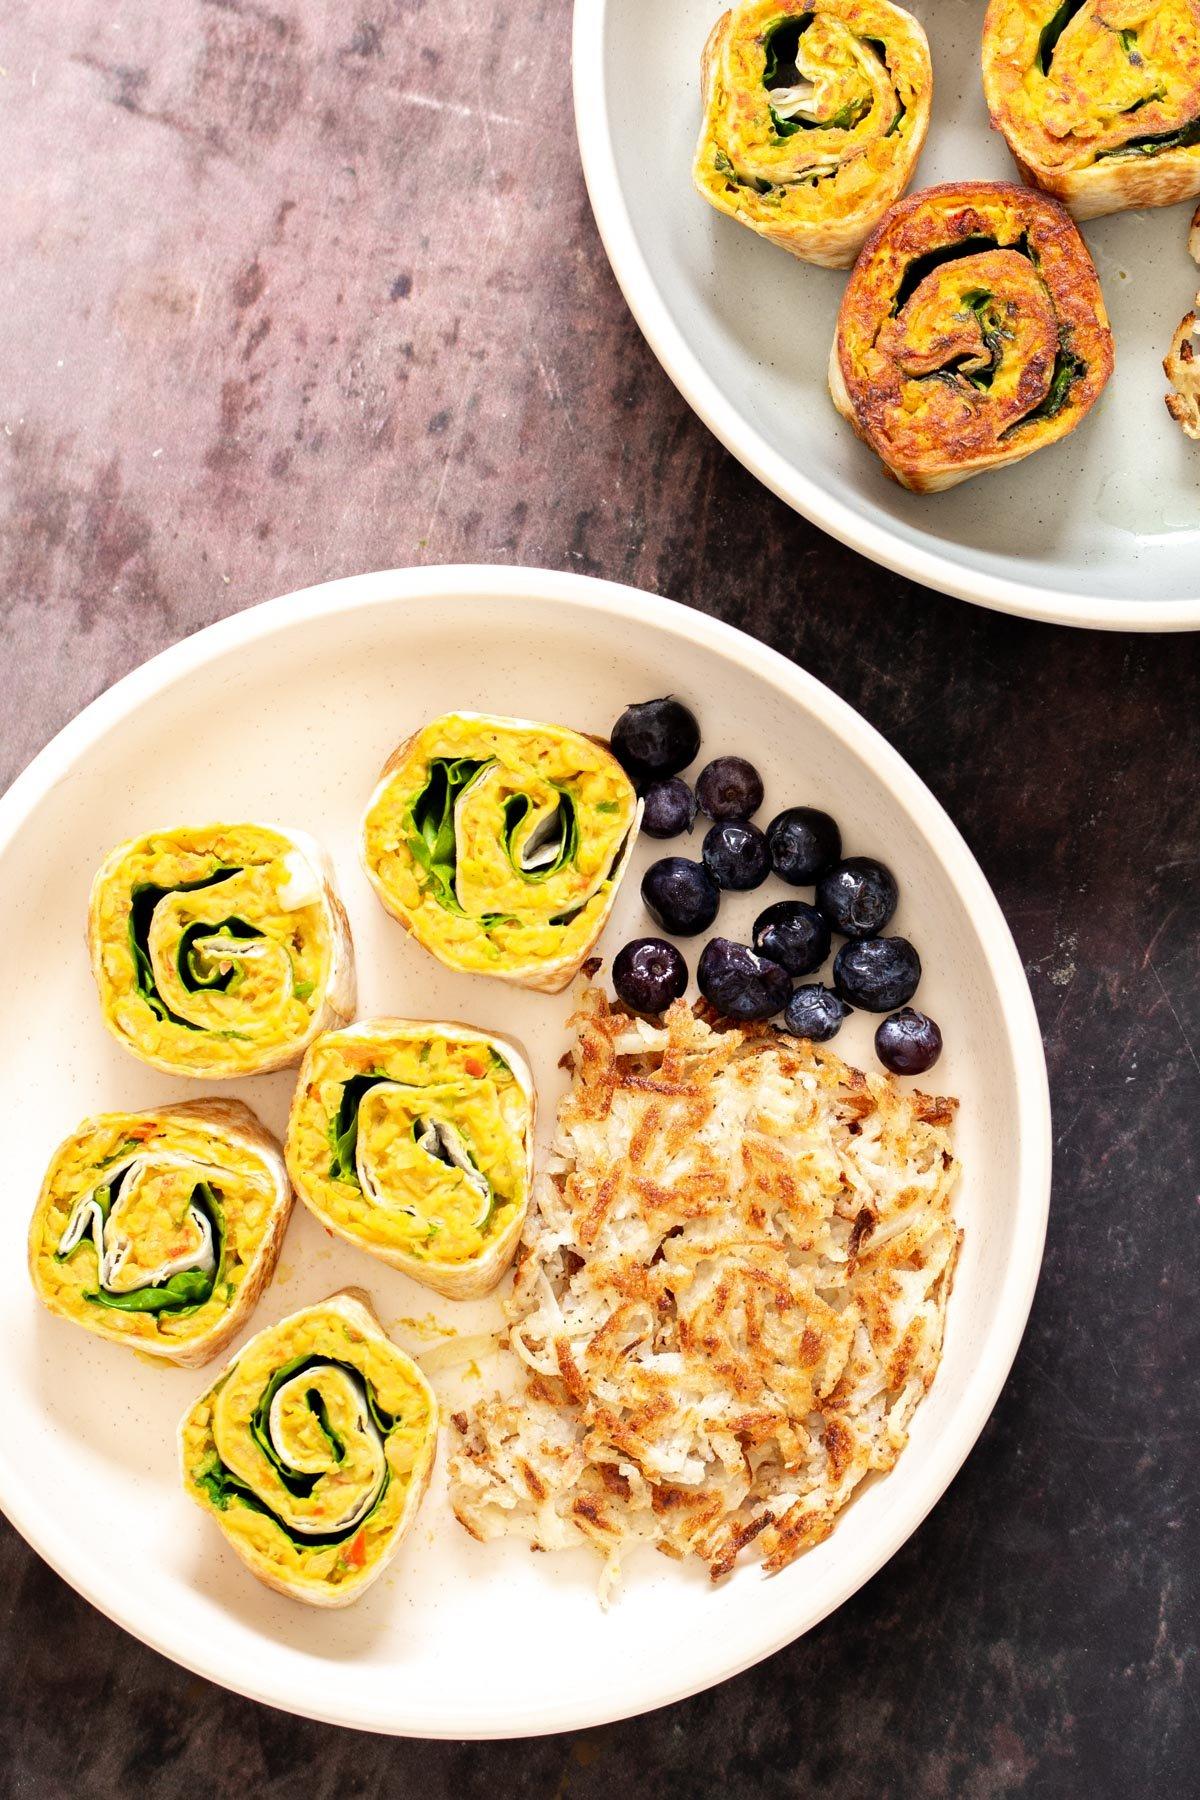 vegan chickpea breakfast platter with vegan chickpea scramble pinwheels, hash brown and berries